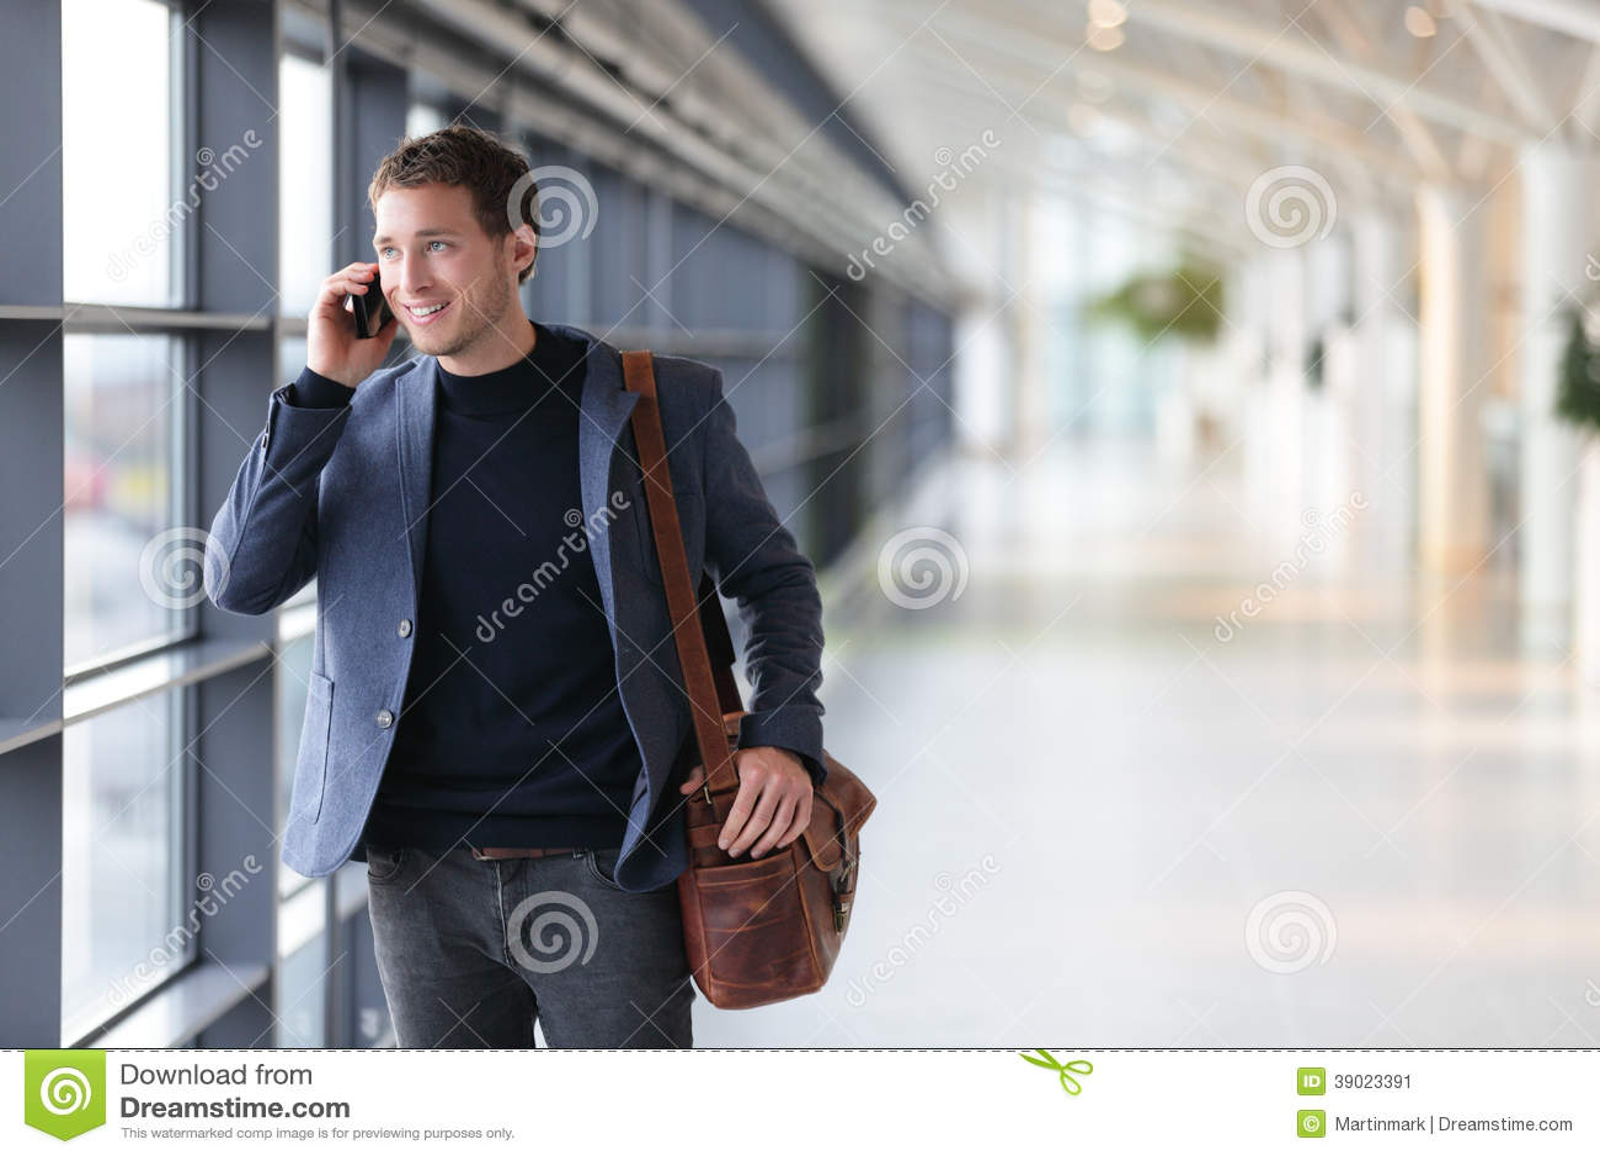 Site Tráfego Em trinta Dias Simples E Descomplicado urban-business-man-talking-smart-phone-traveling-walking-inside-airport-casual-young-businessman-wearing-suit-jacket-39023391